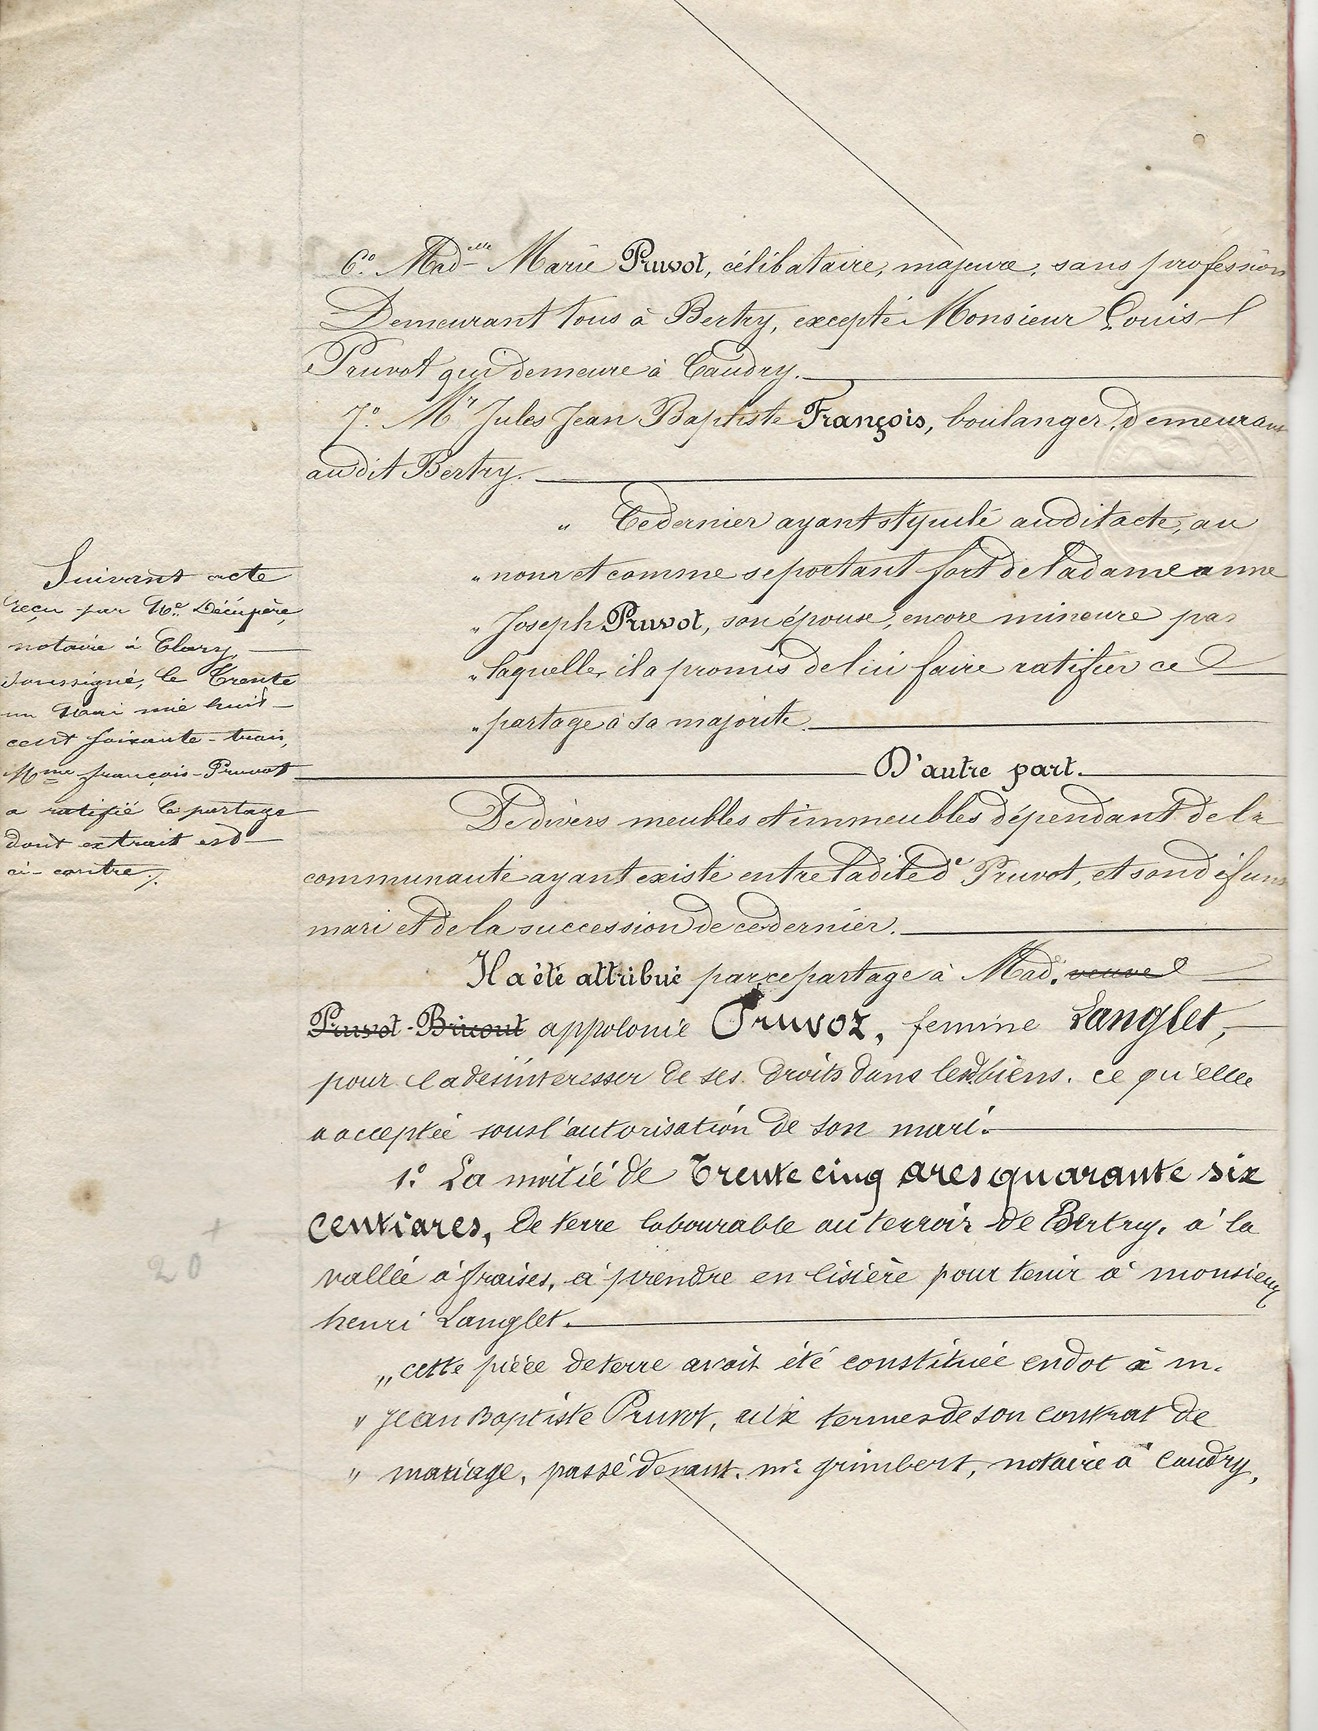 1863 partage ch bricout vve pruvot 002